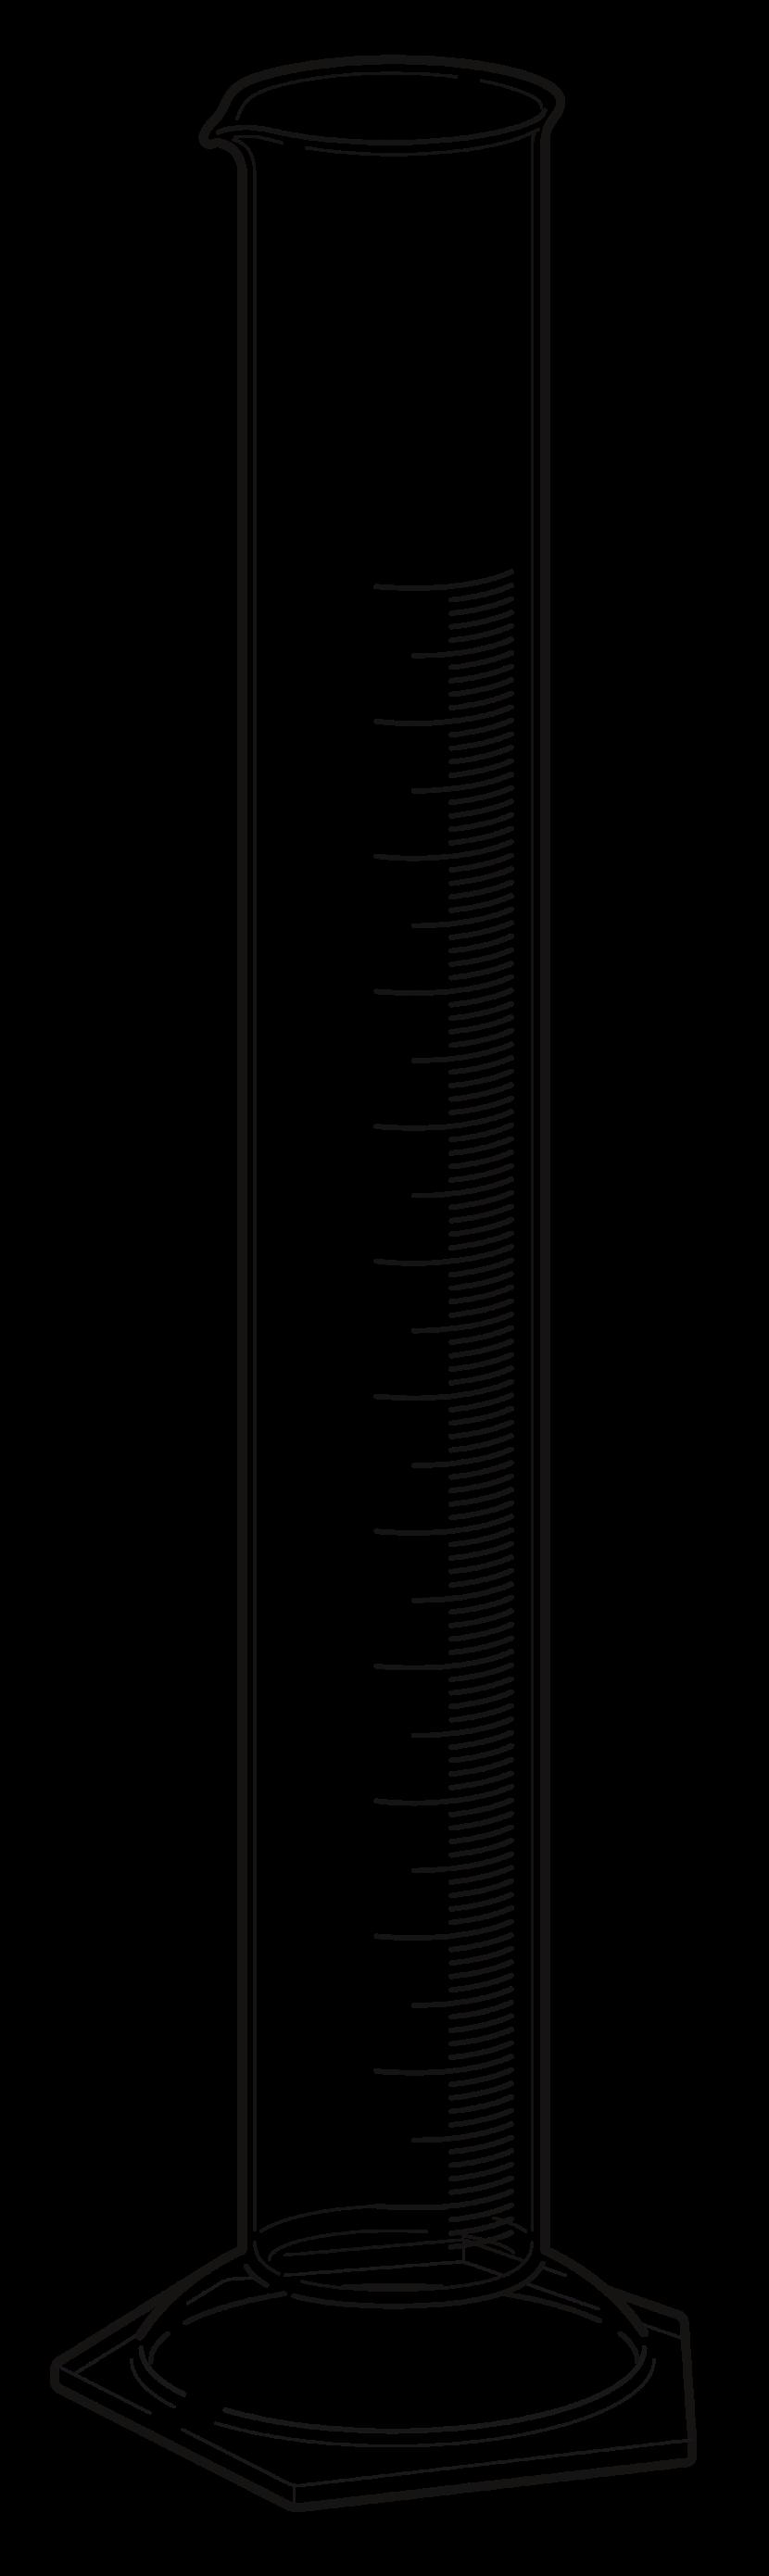 Cylinder clip art.